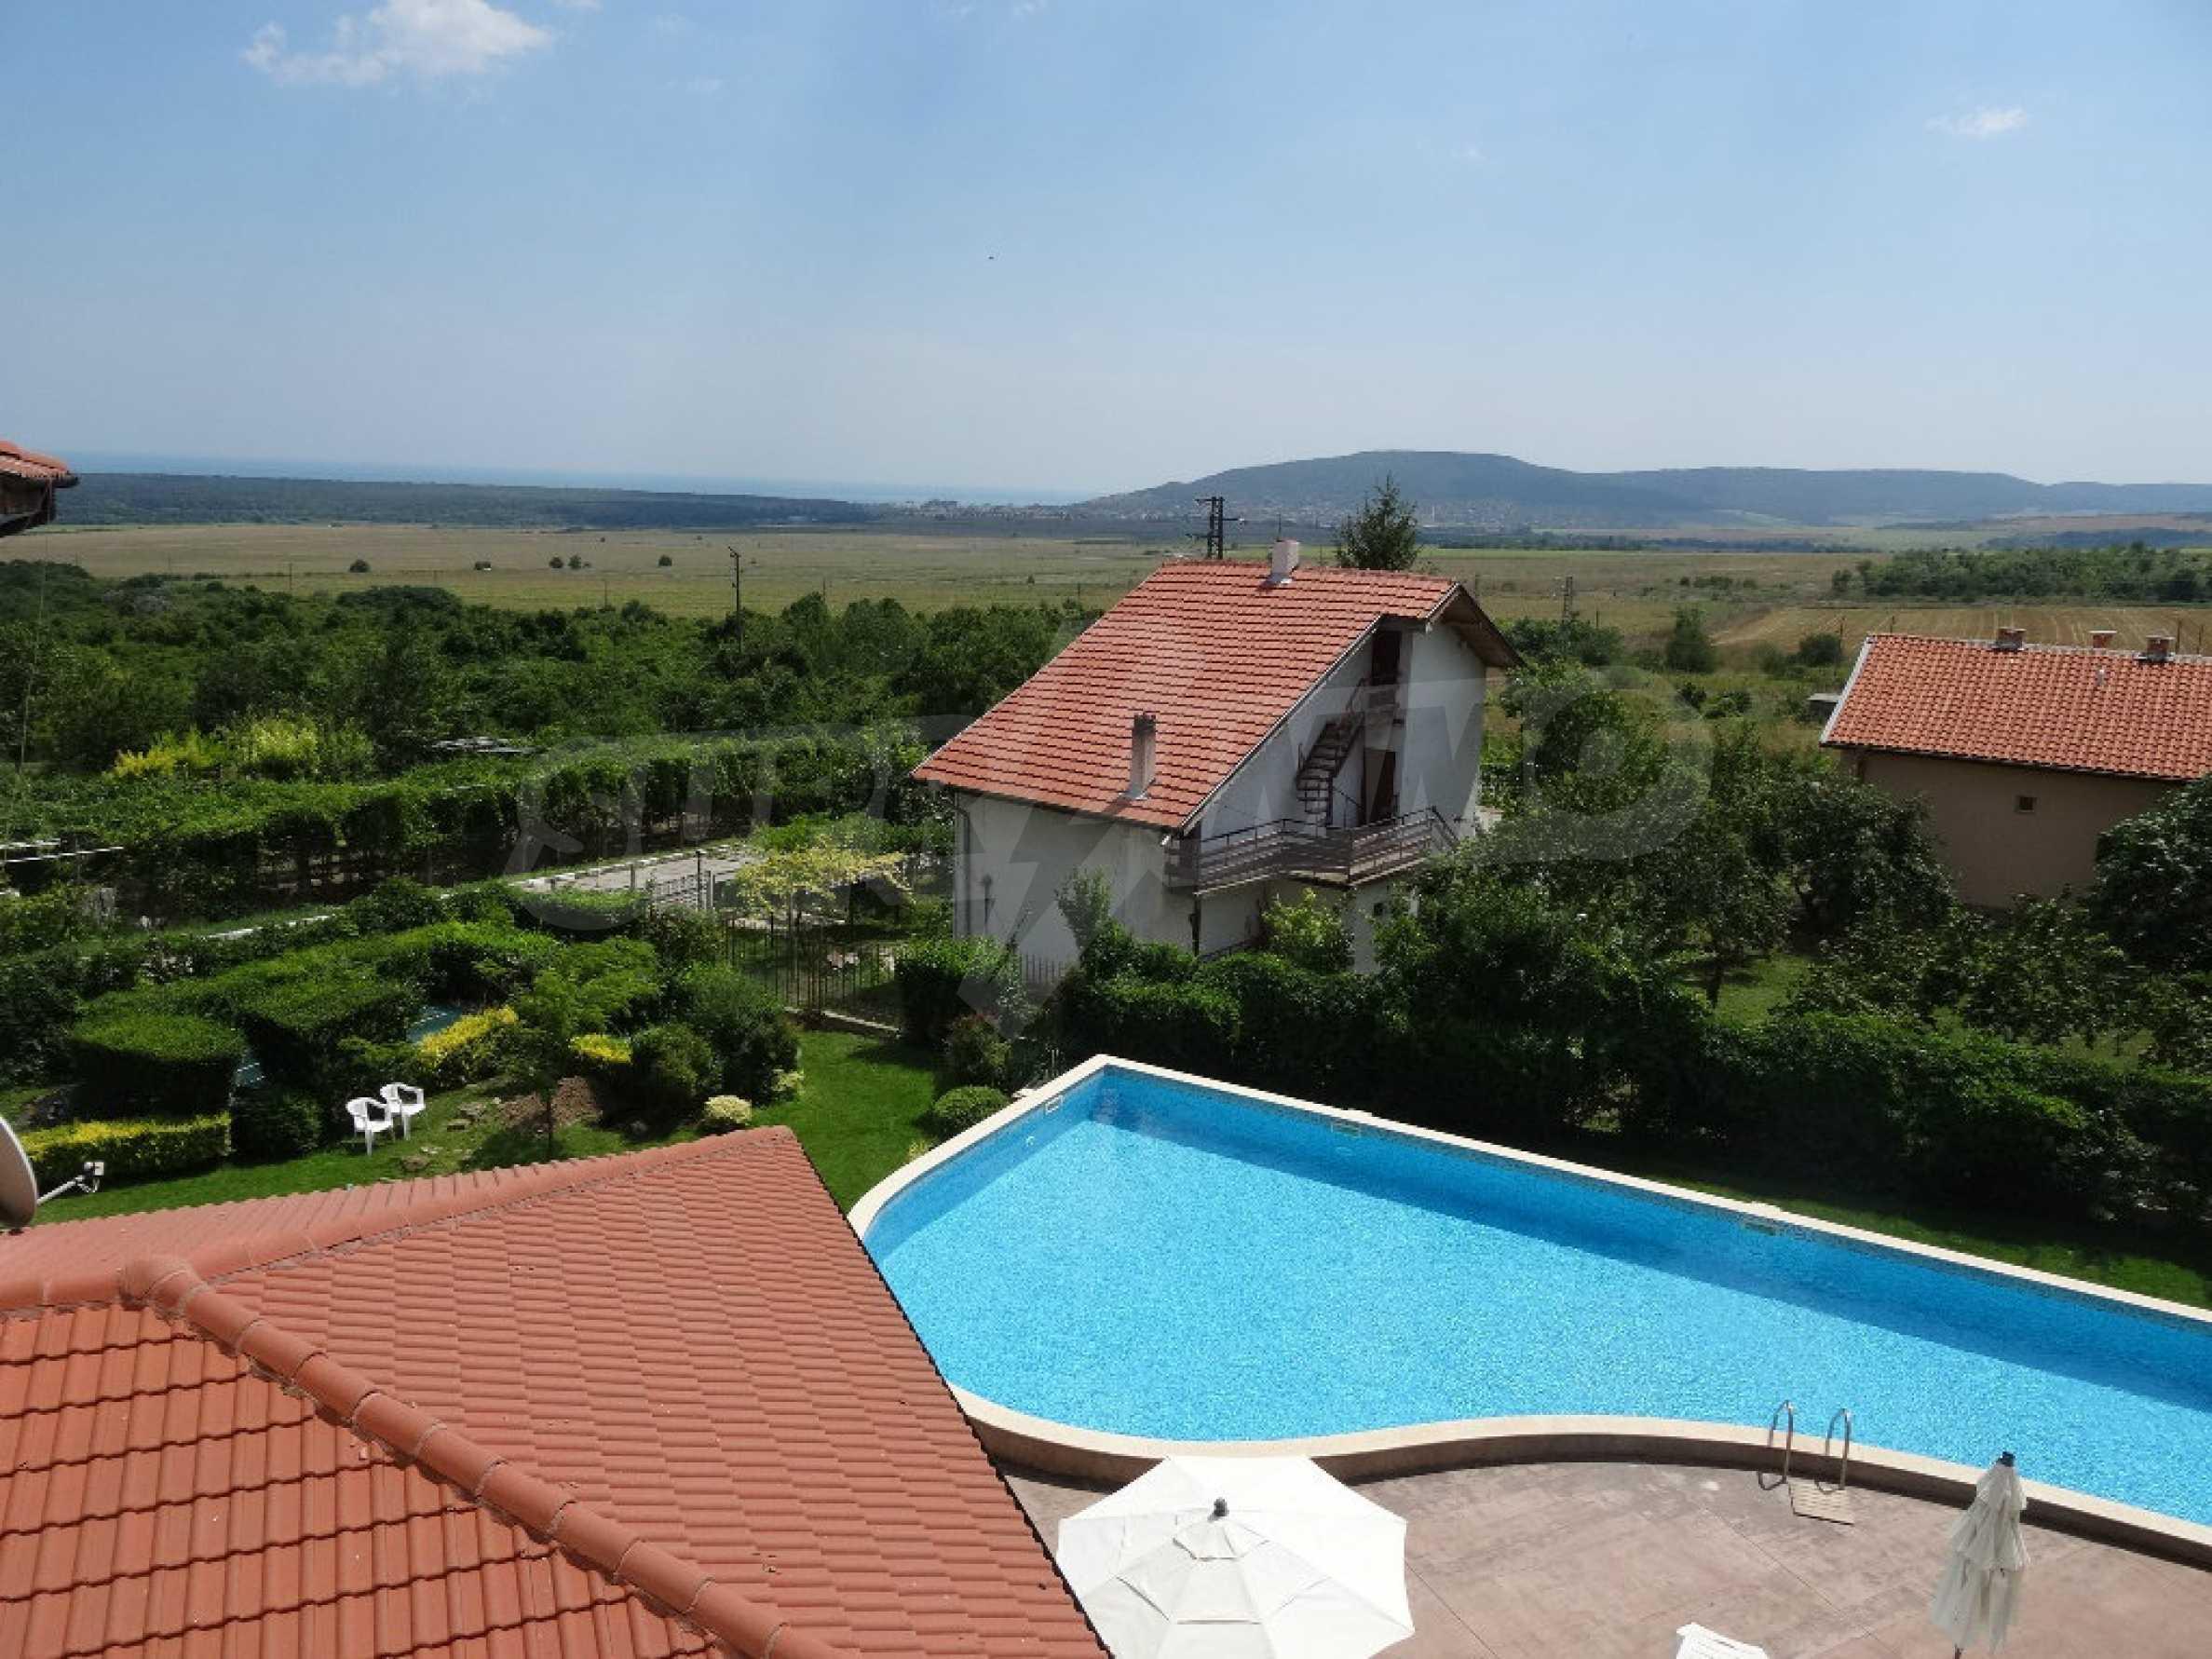 Тристаен апартамент до ключ близо до курорти Албена и Кранево 8